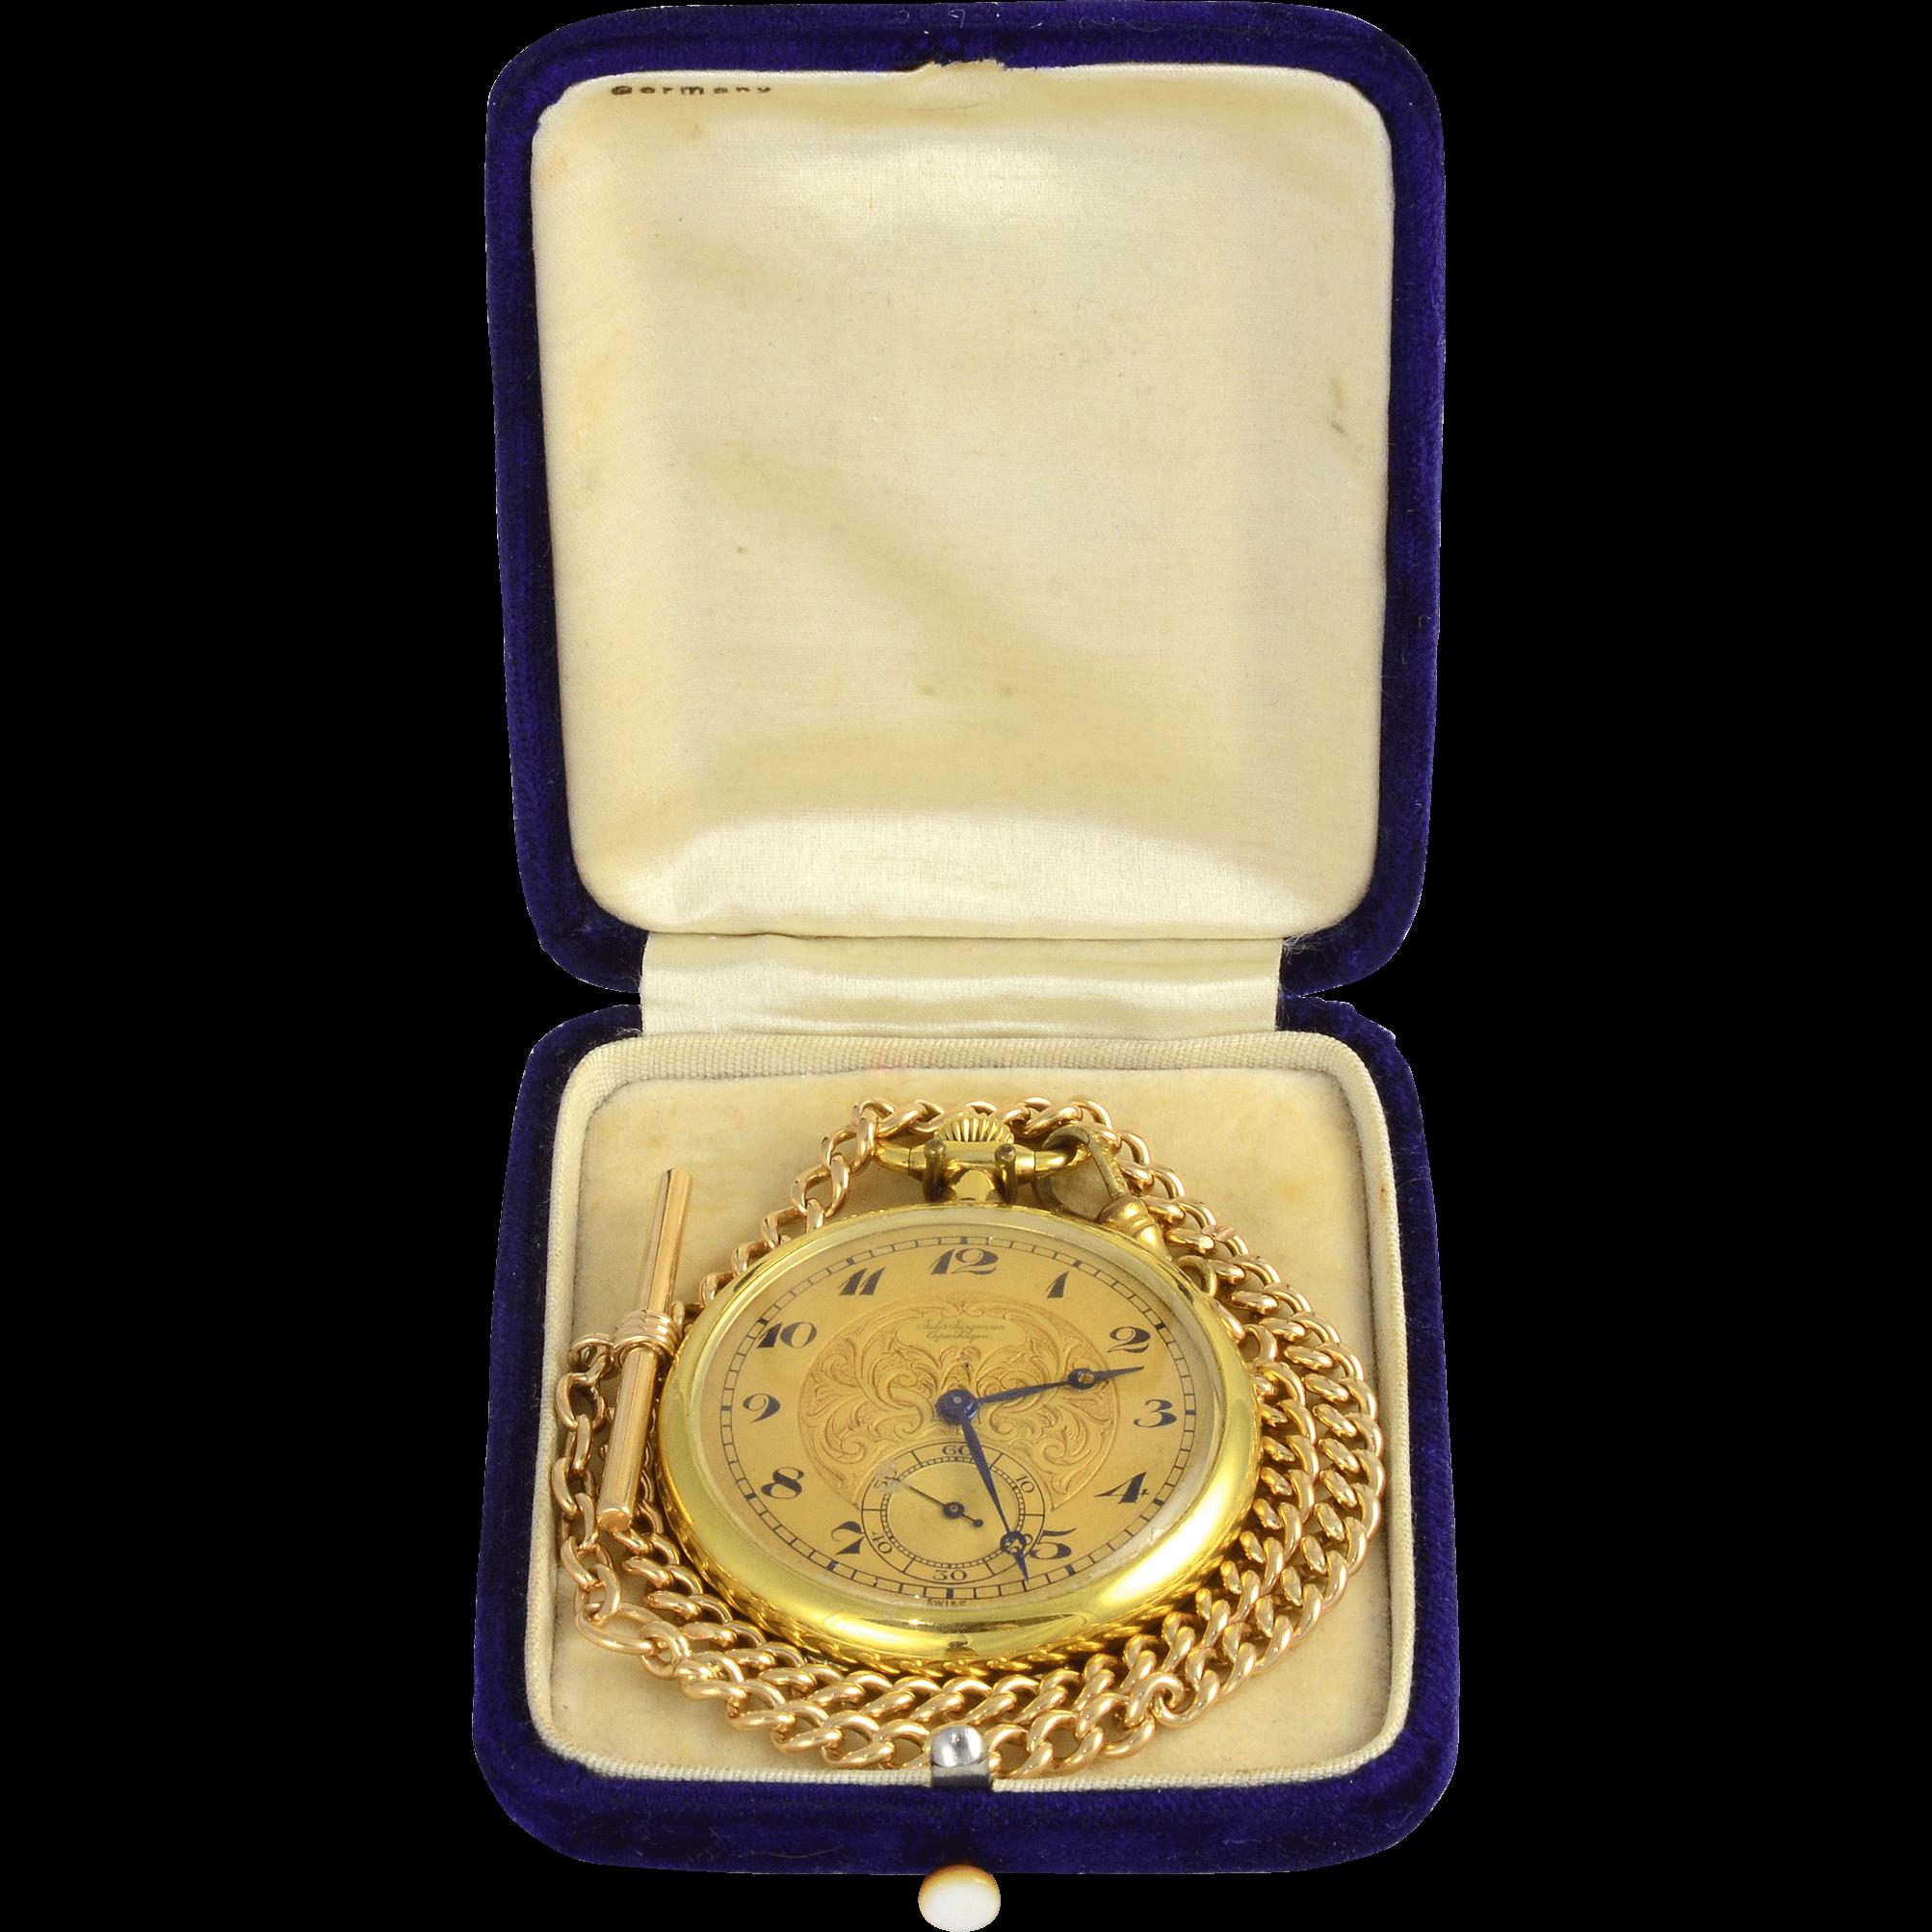 Swiss 18K Yellow Gold Pocket Watch and Chain by Jules Jurgensen